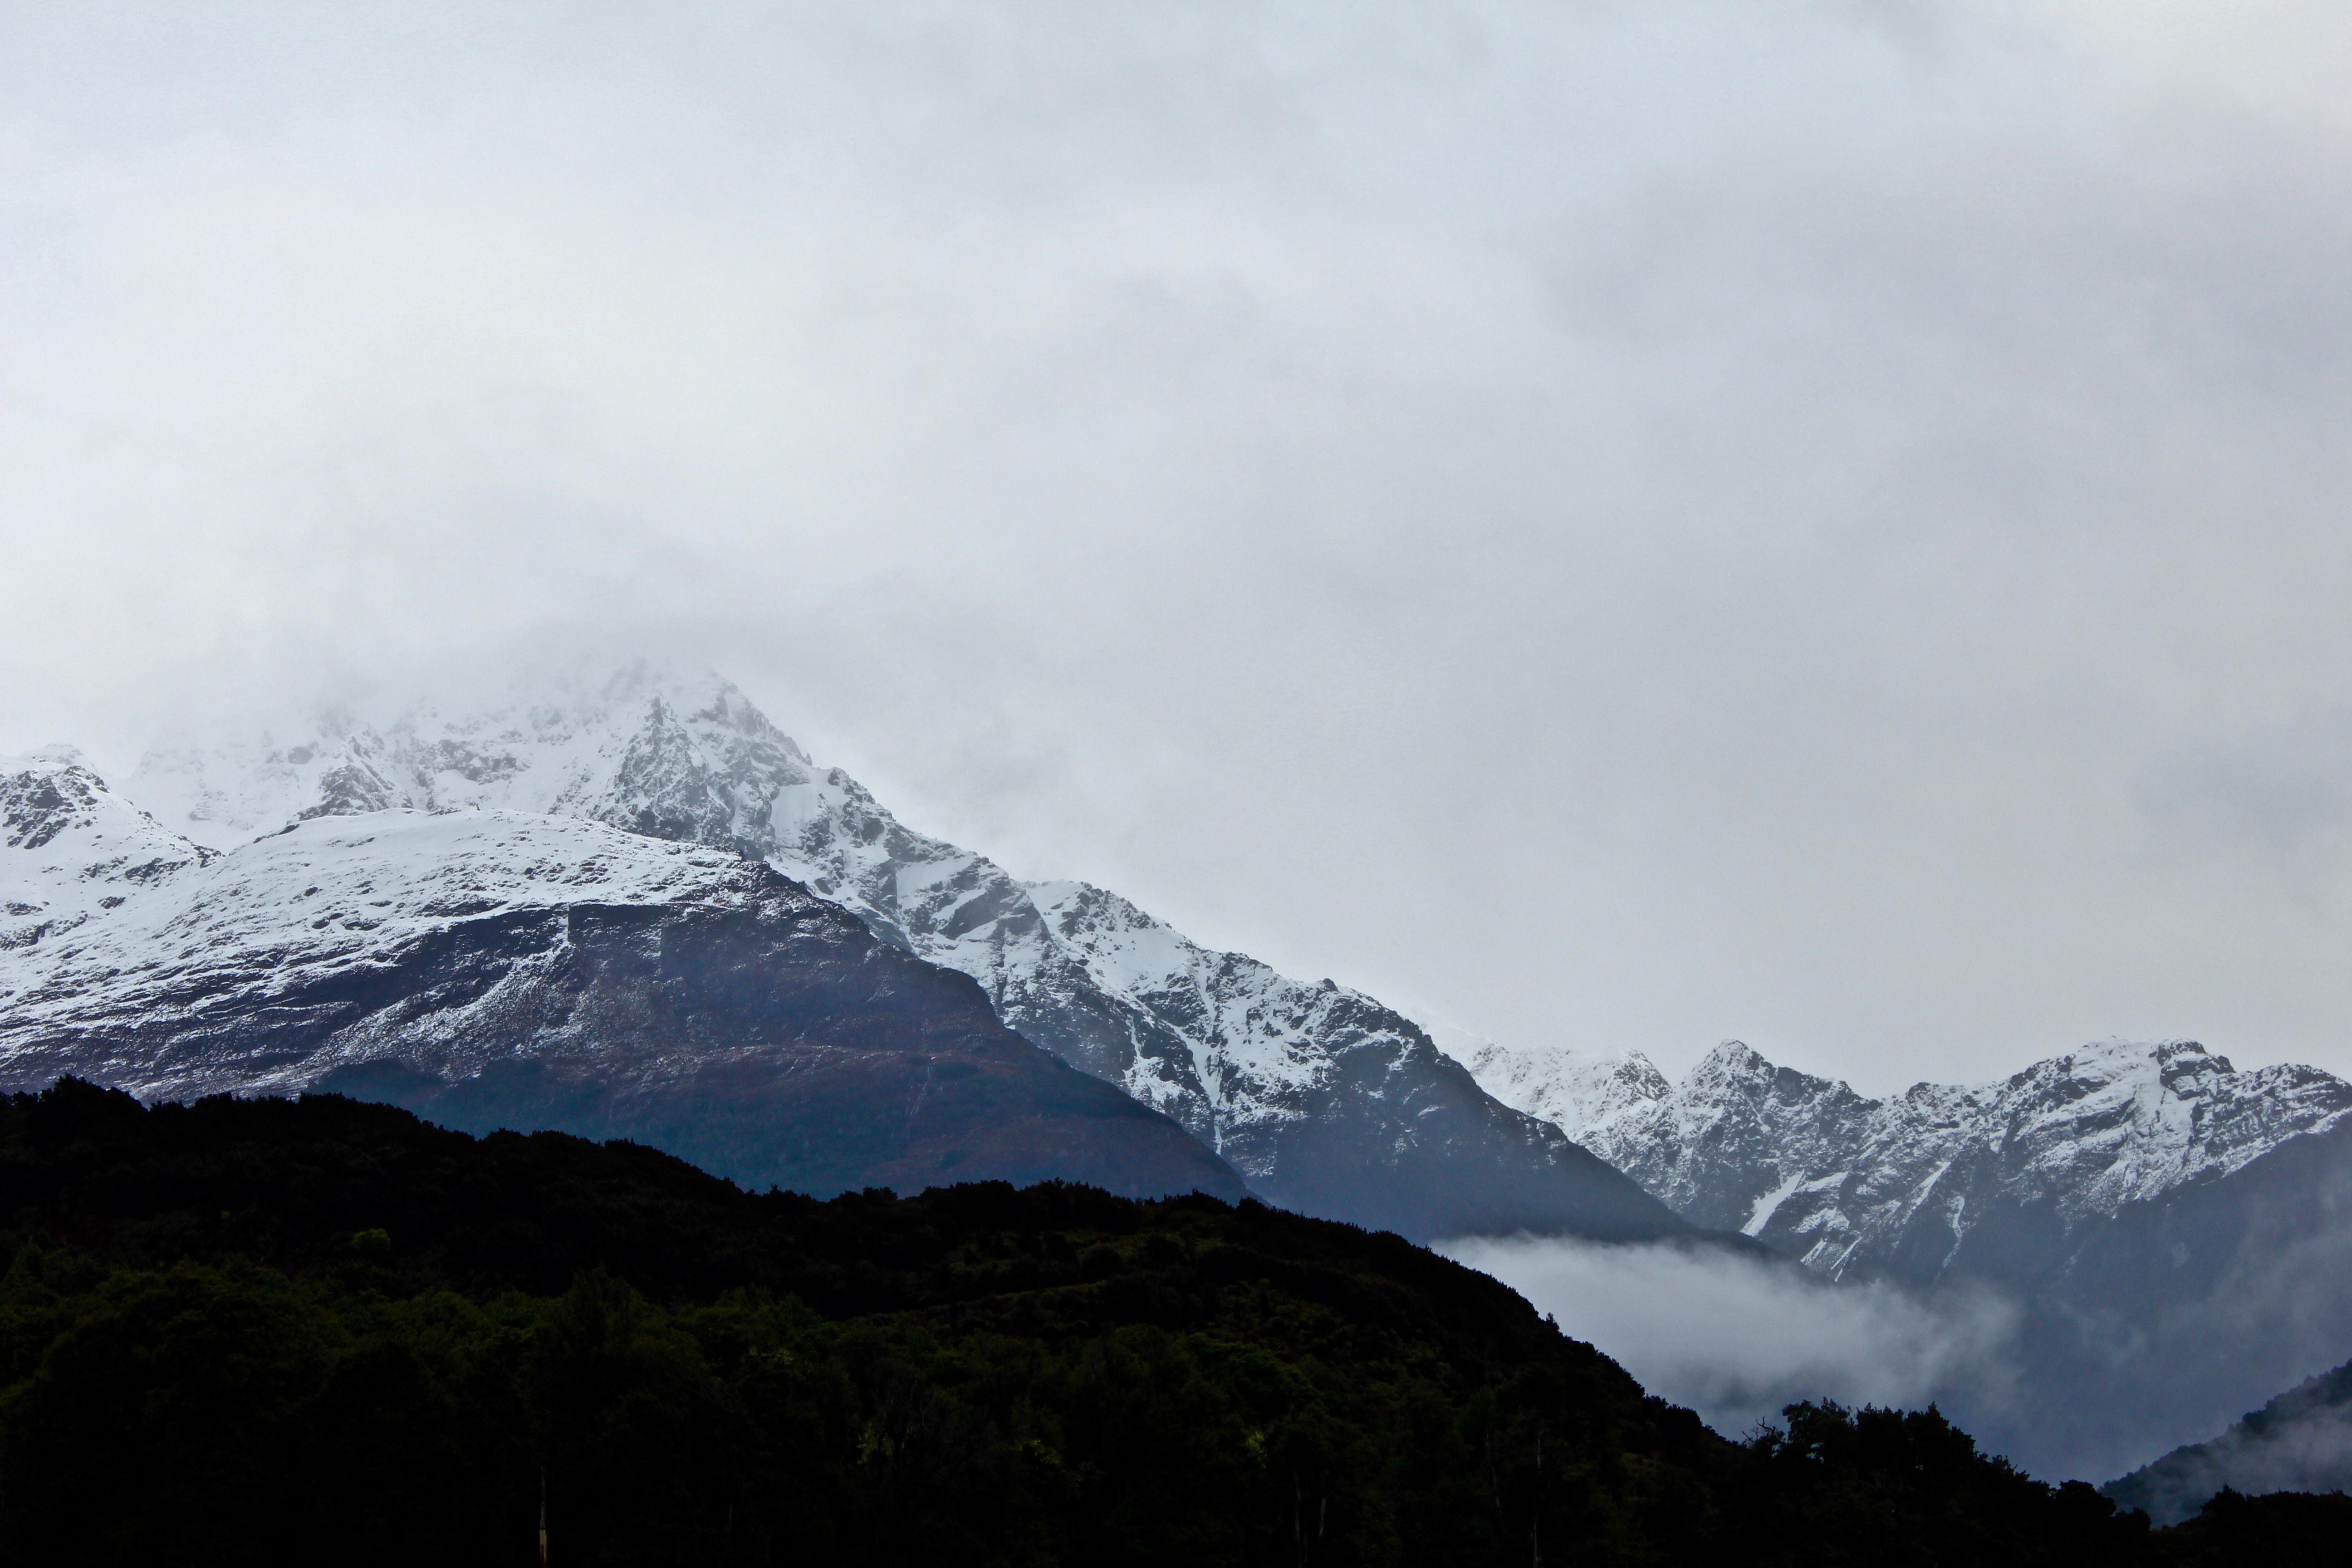 Snow-capped mountains fade into a foggy sky